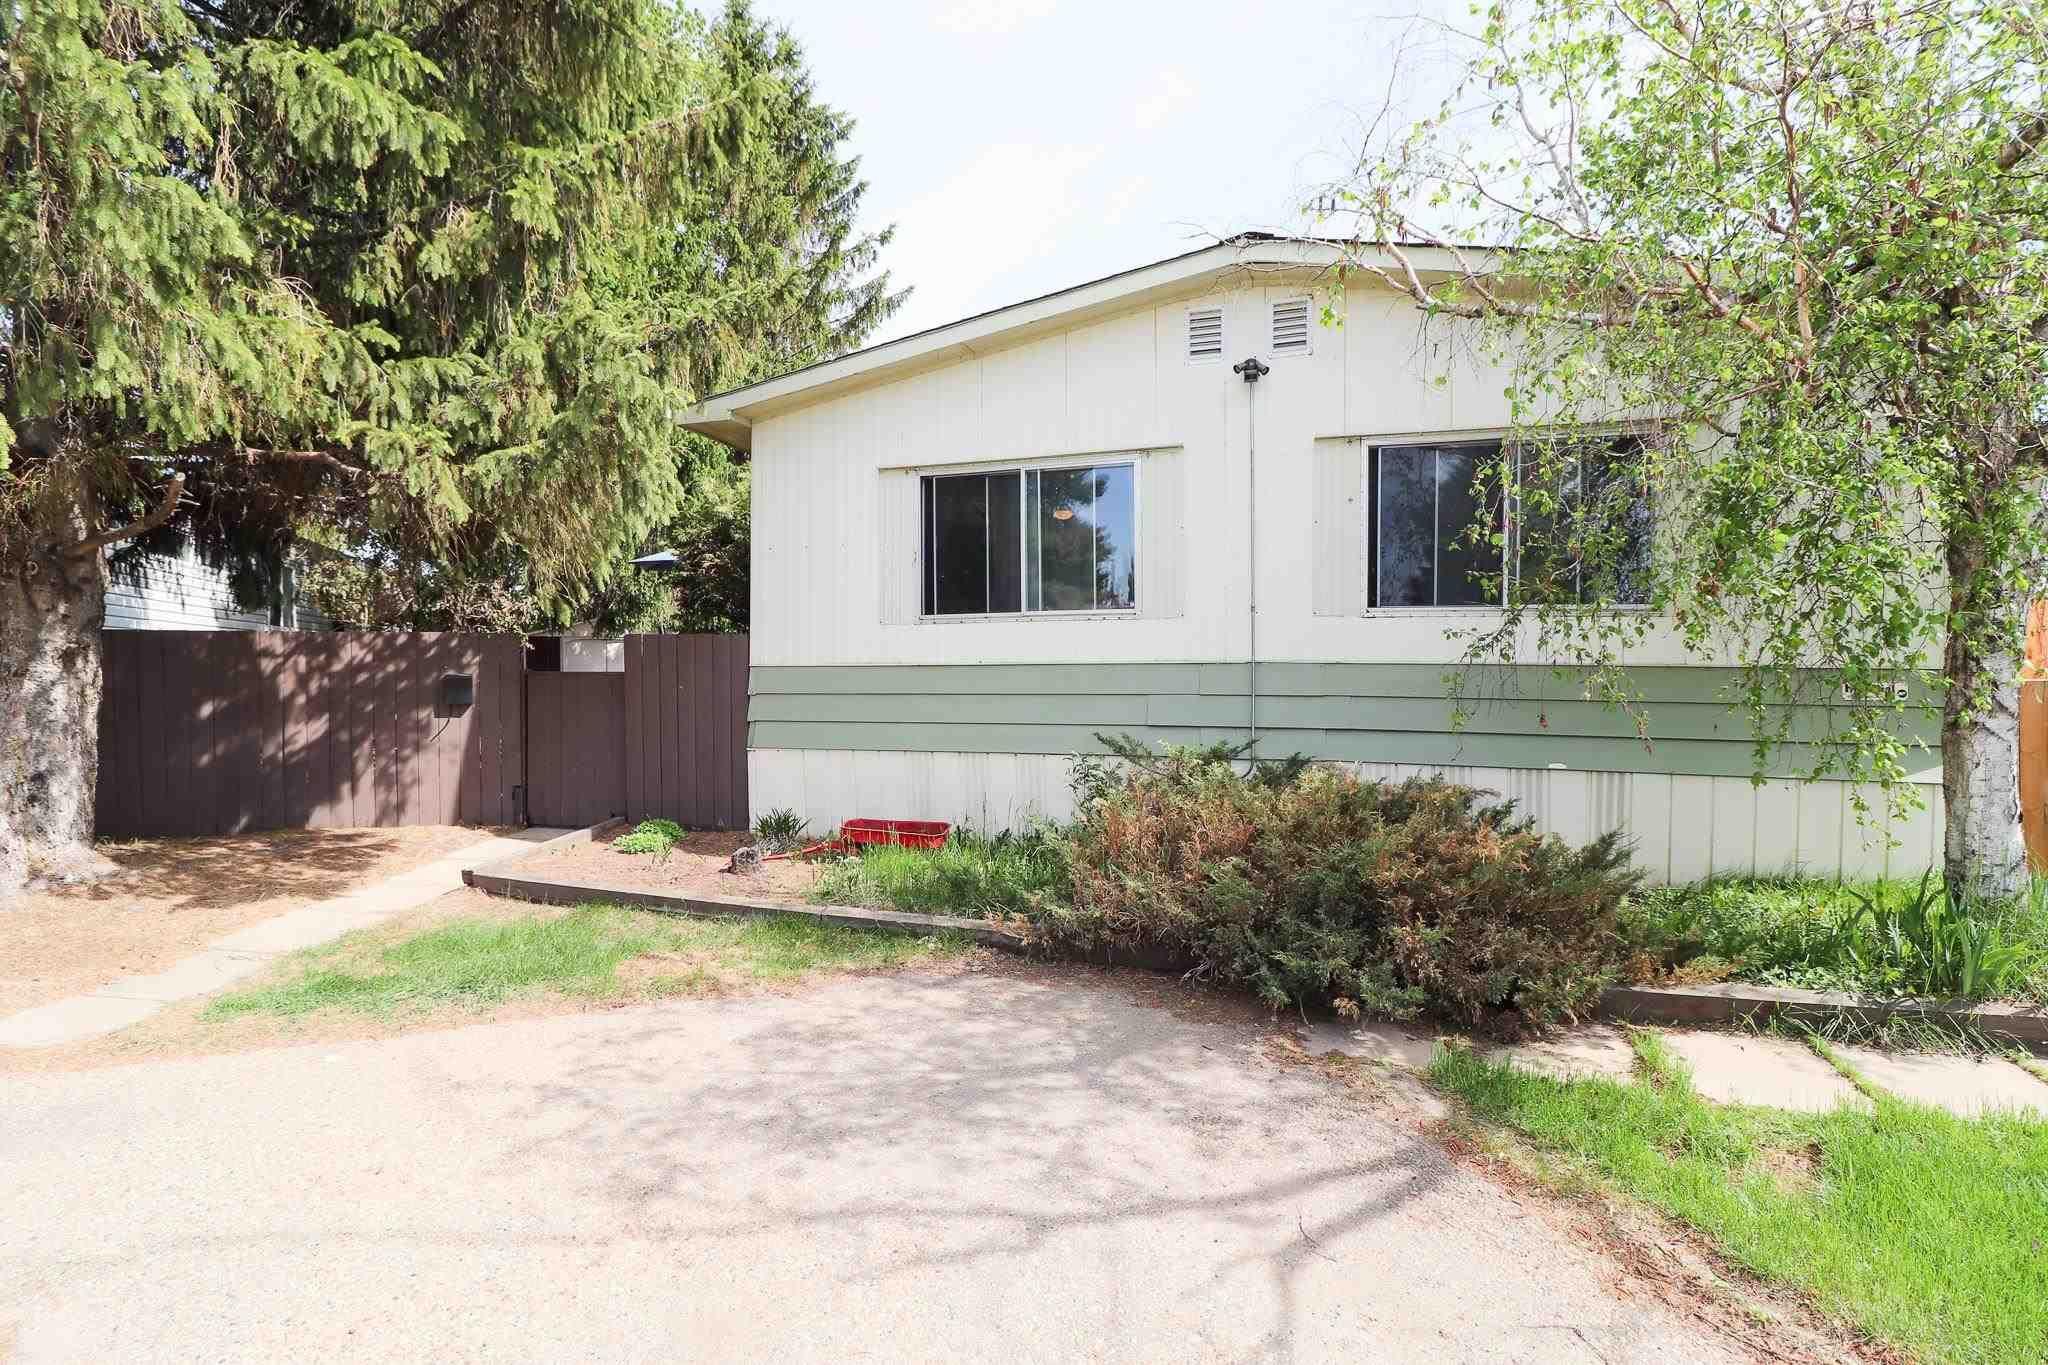 Main Photo: 1712 West Oak Close in Edmonton: Zone 59 Mobile for sale : MLS®# E4247726